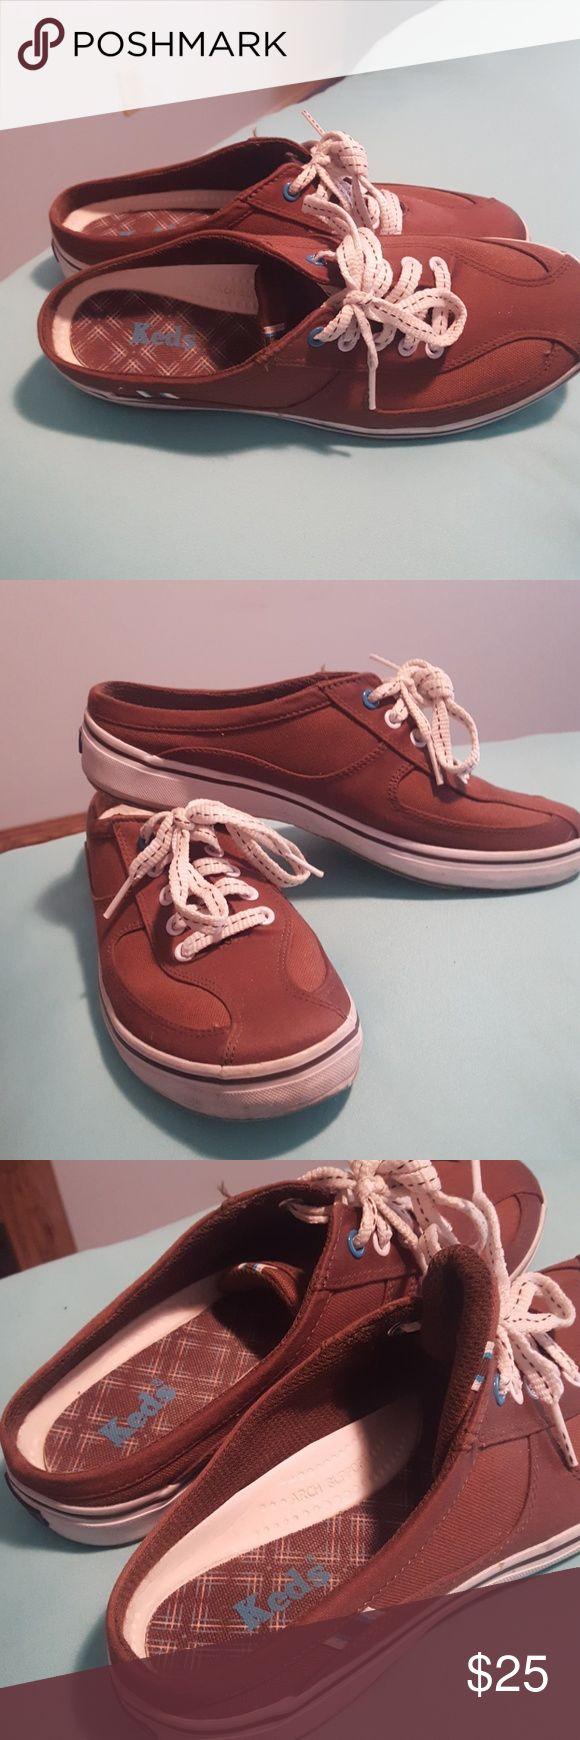 Keds brown slip on tennis shoes Excellent conditions keds tennis shoes size 6 .5 keds Shoes Mules & Clogs